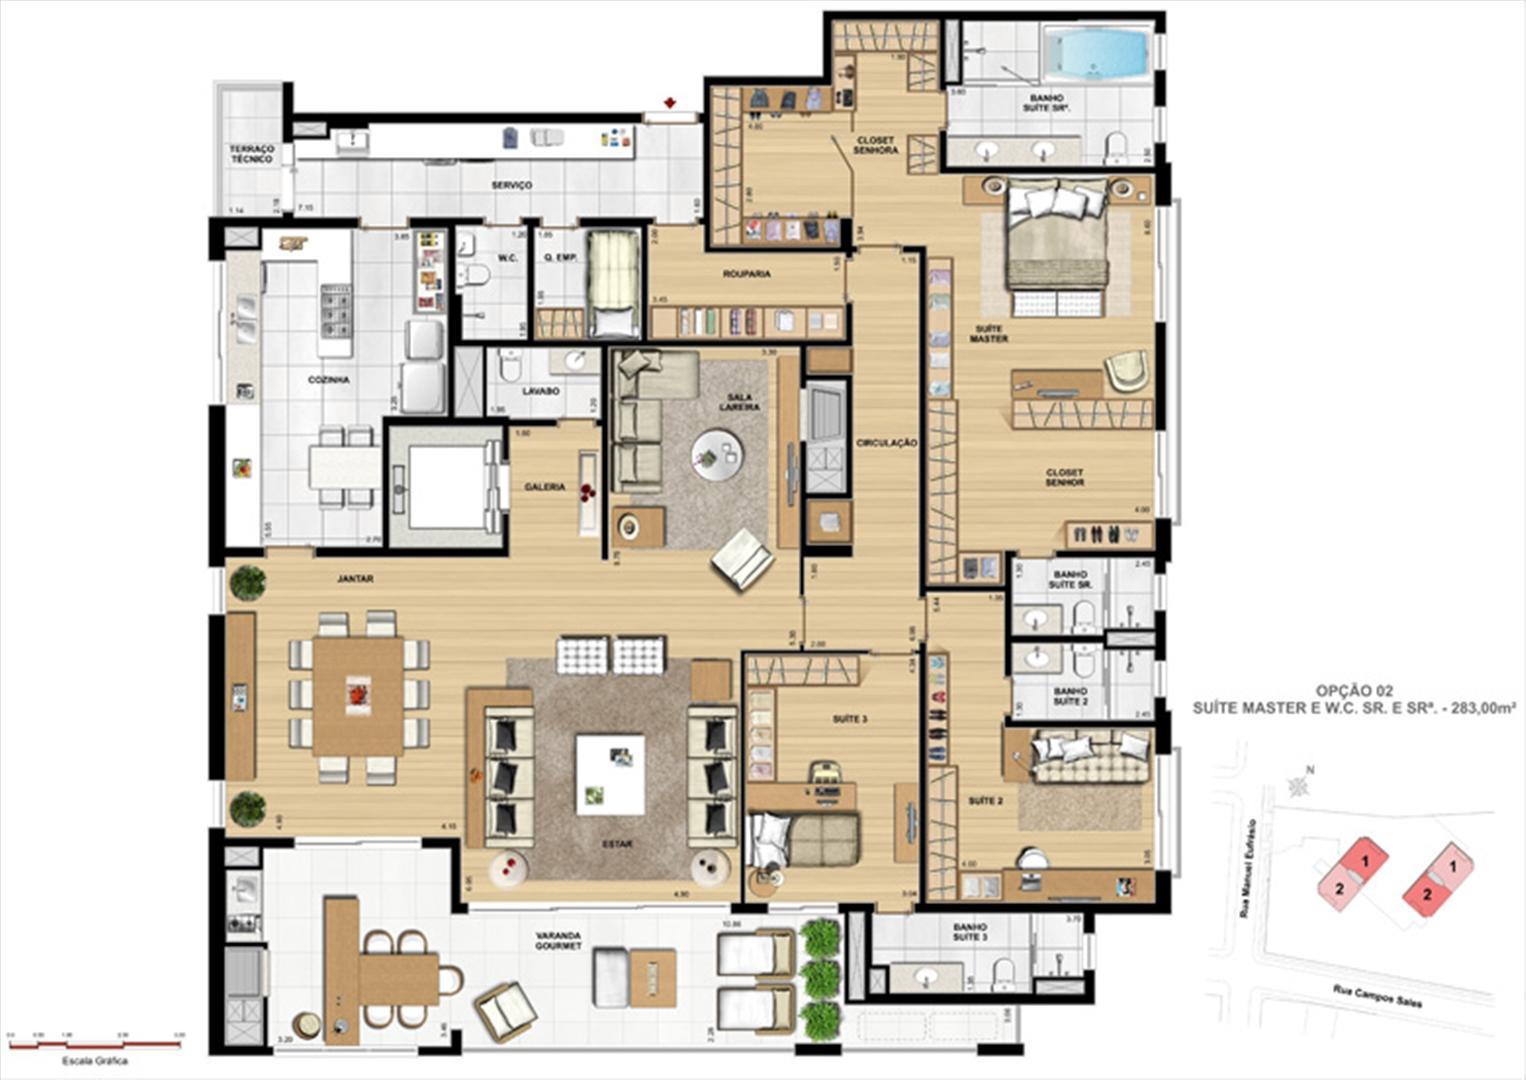 Suíte master | Le Chateau  – Apartamento no  Juvevê - Curitiba - Paraná